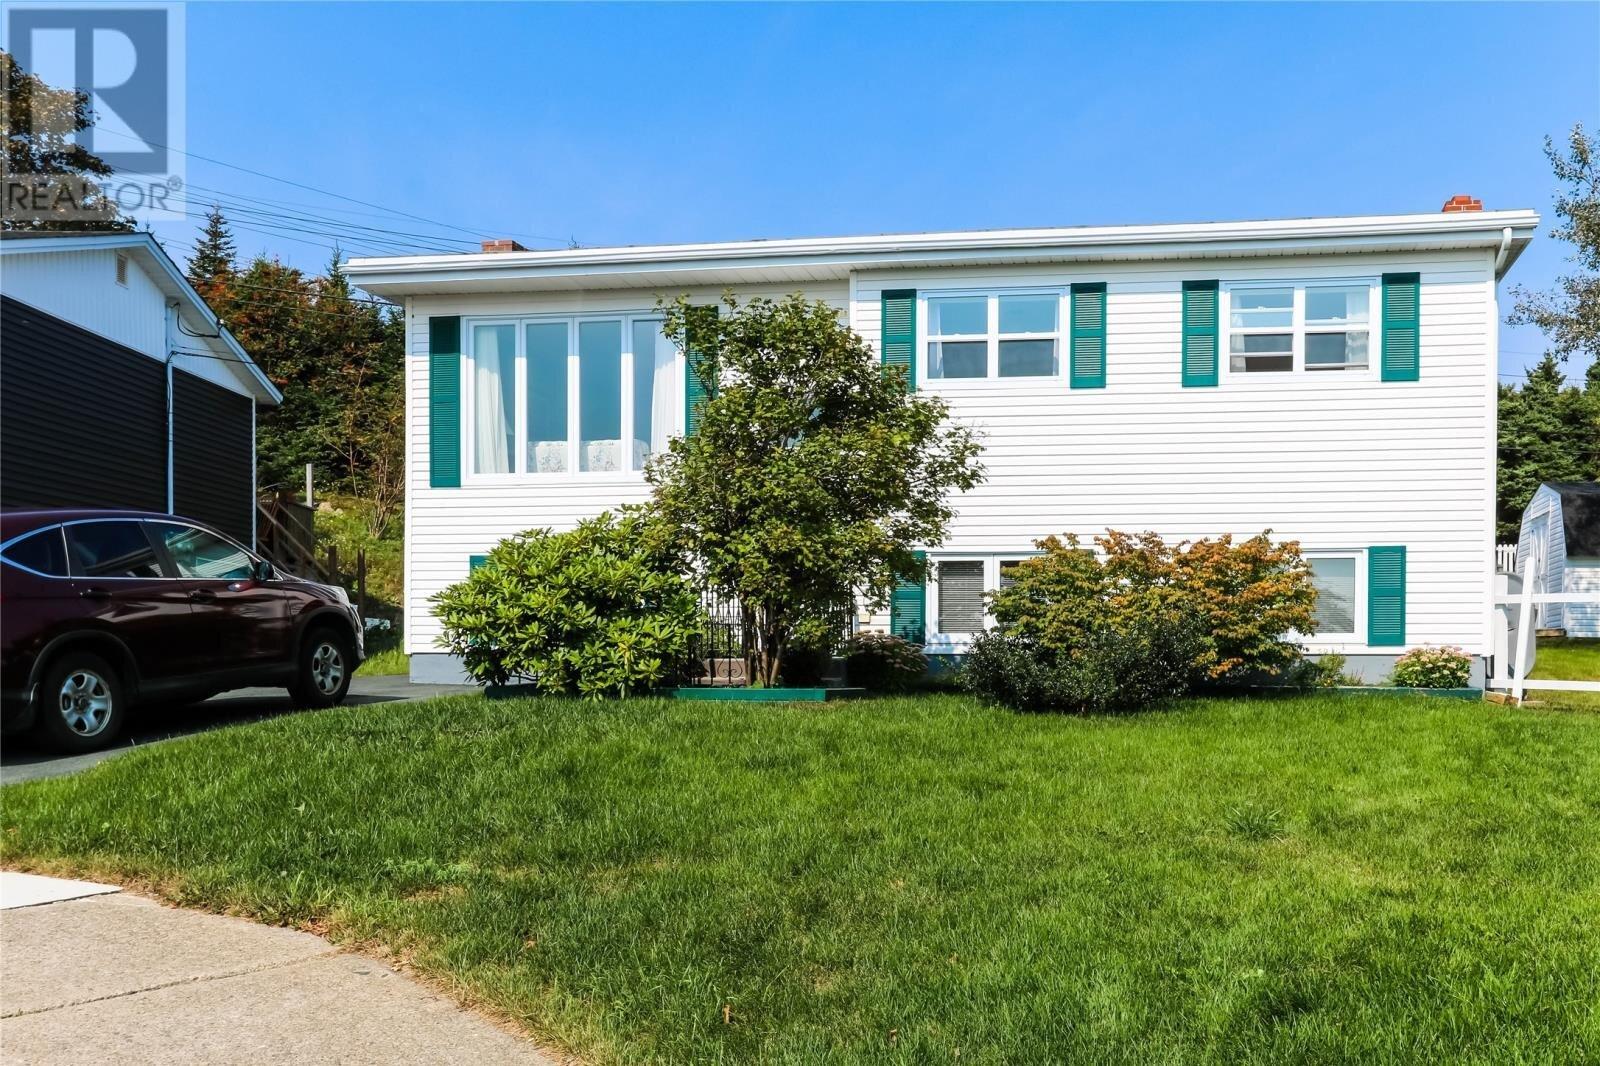 House for sale at 14 Collins Pl St. John's Newfoundland - MLS: 1222886